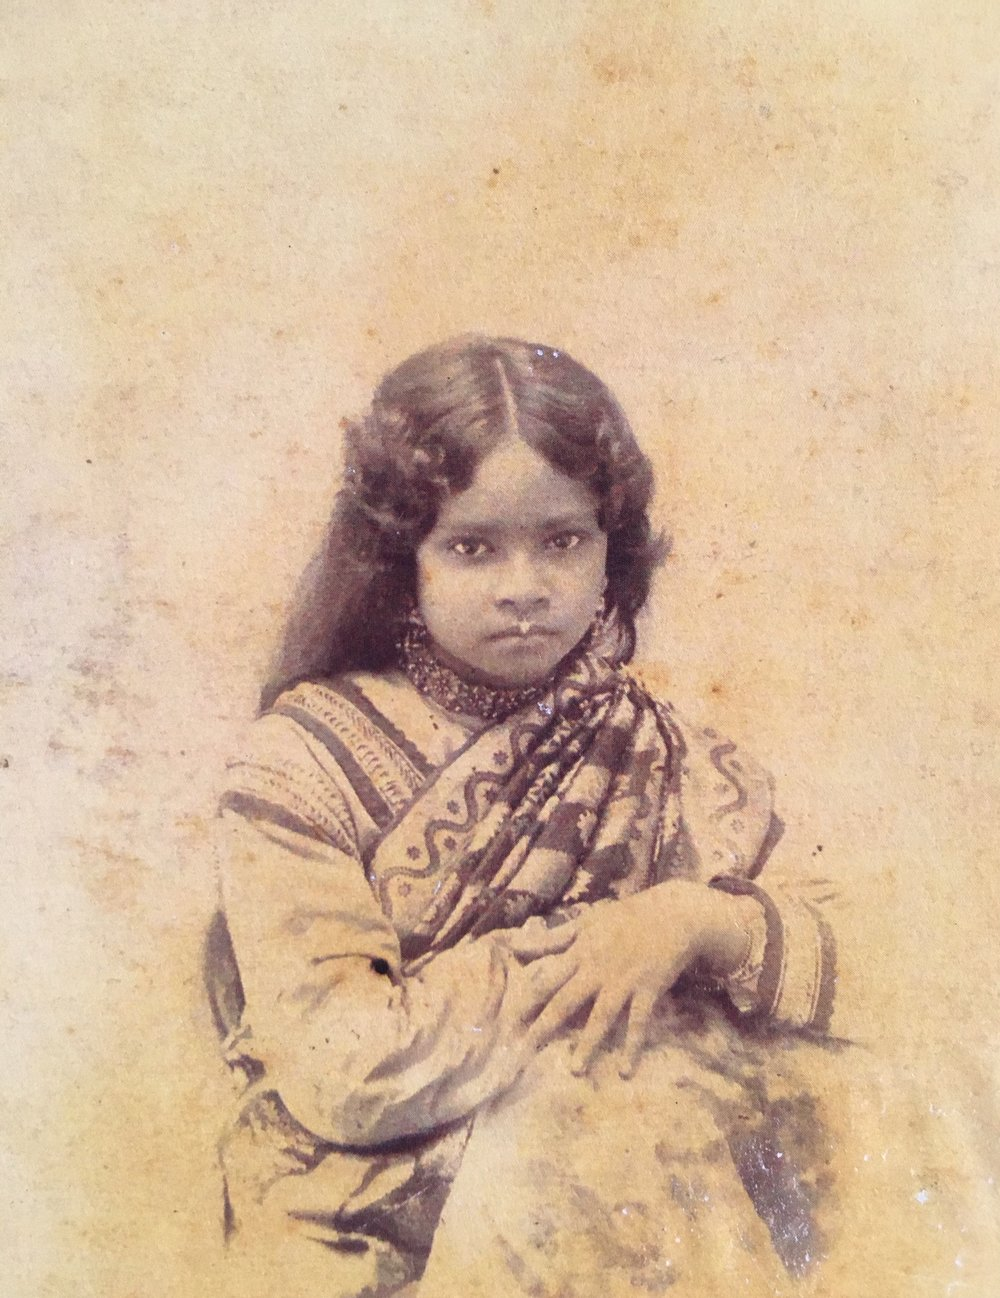 Vintage woman photo from kolkata